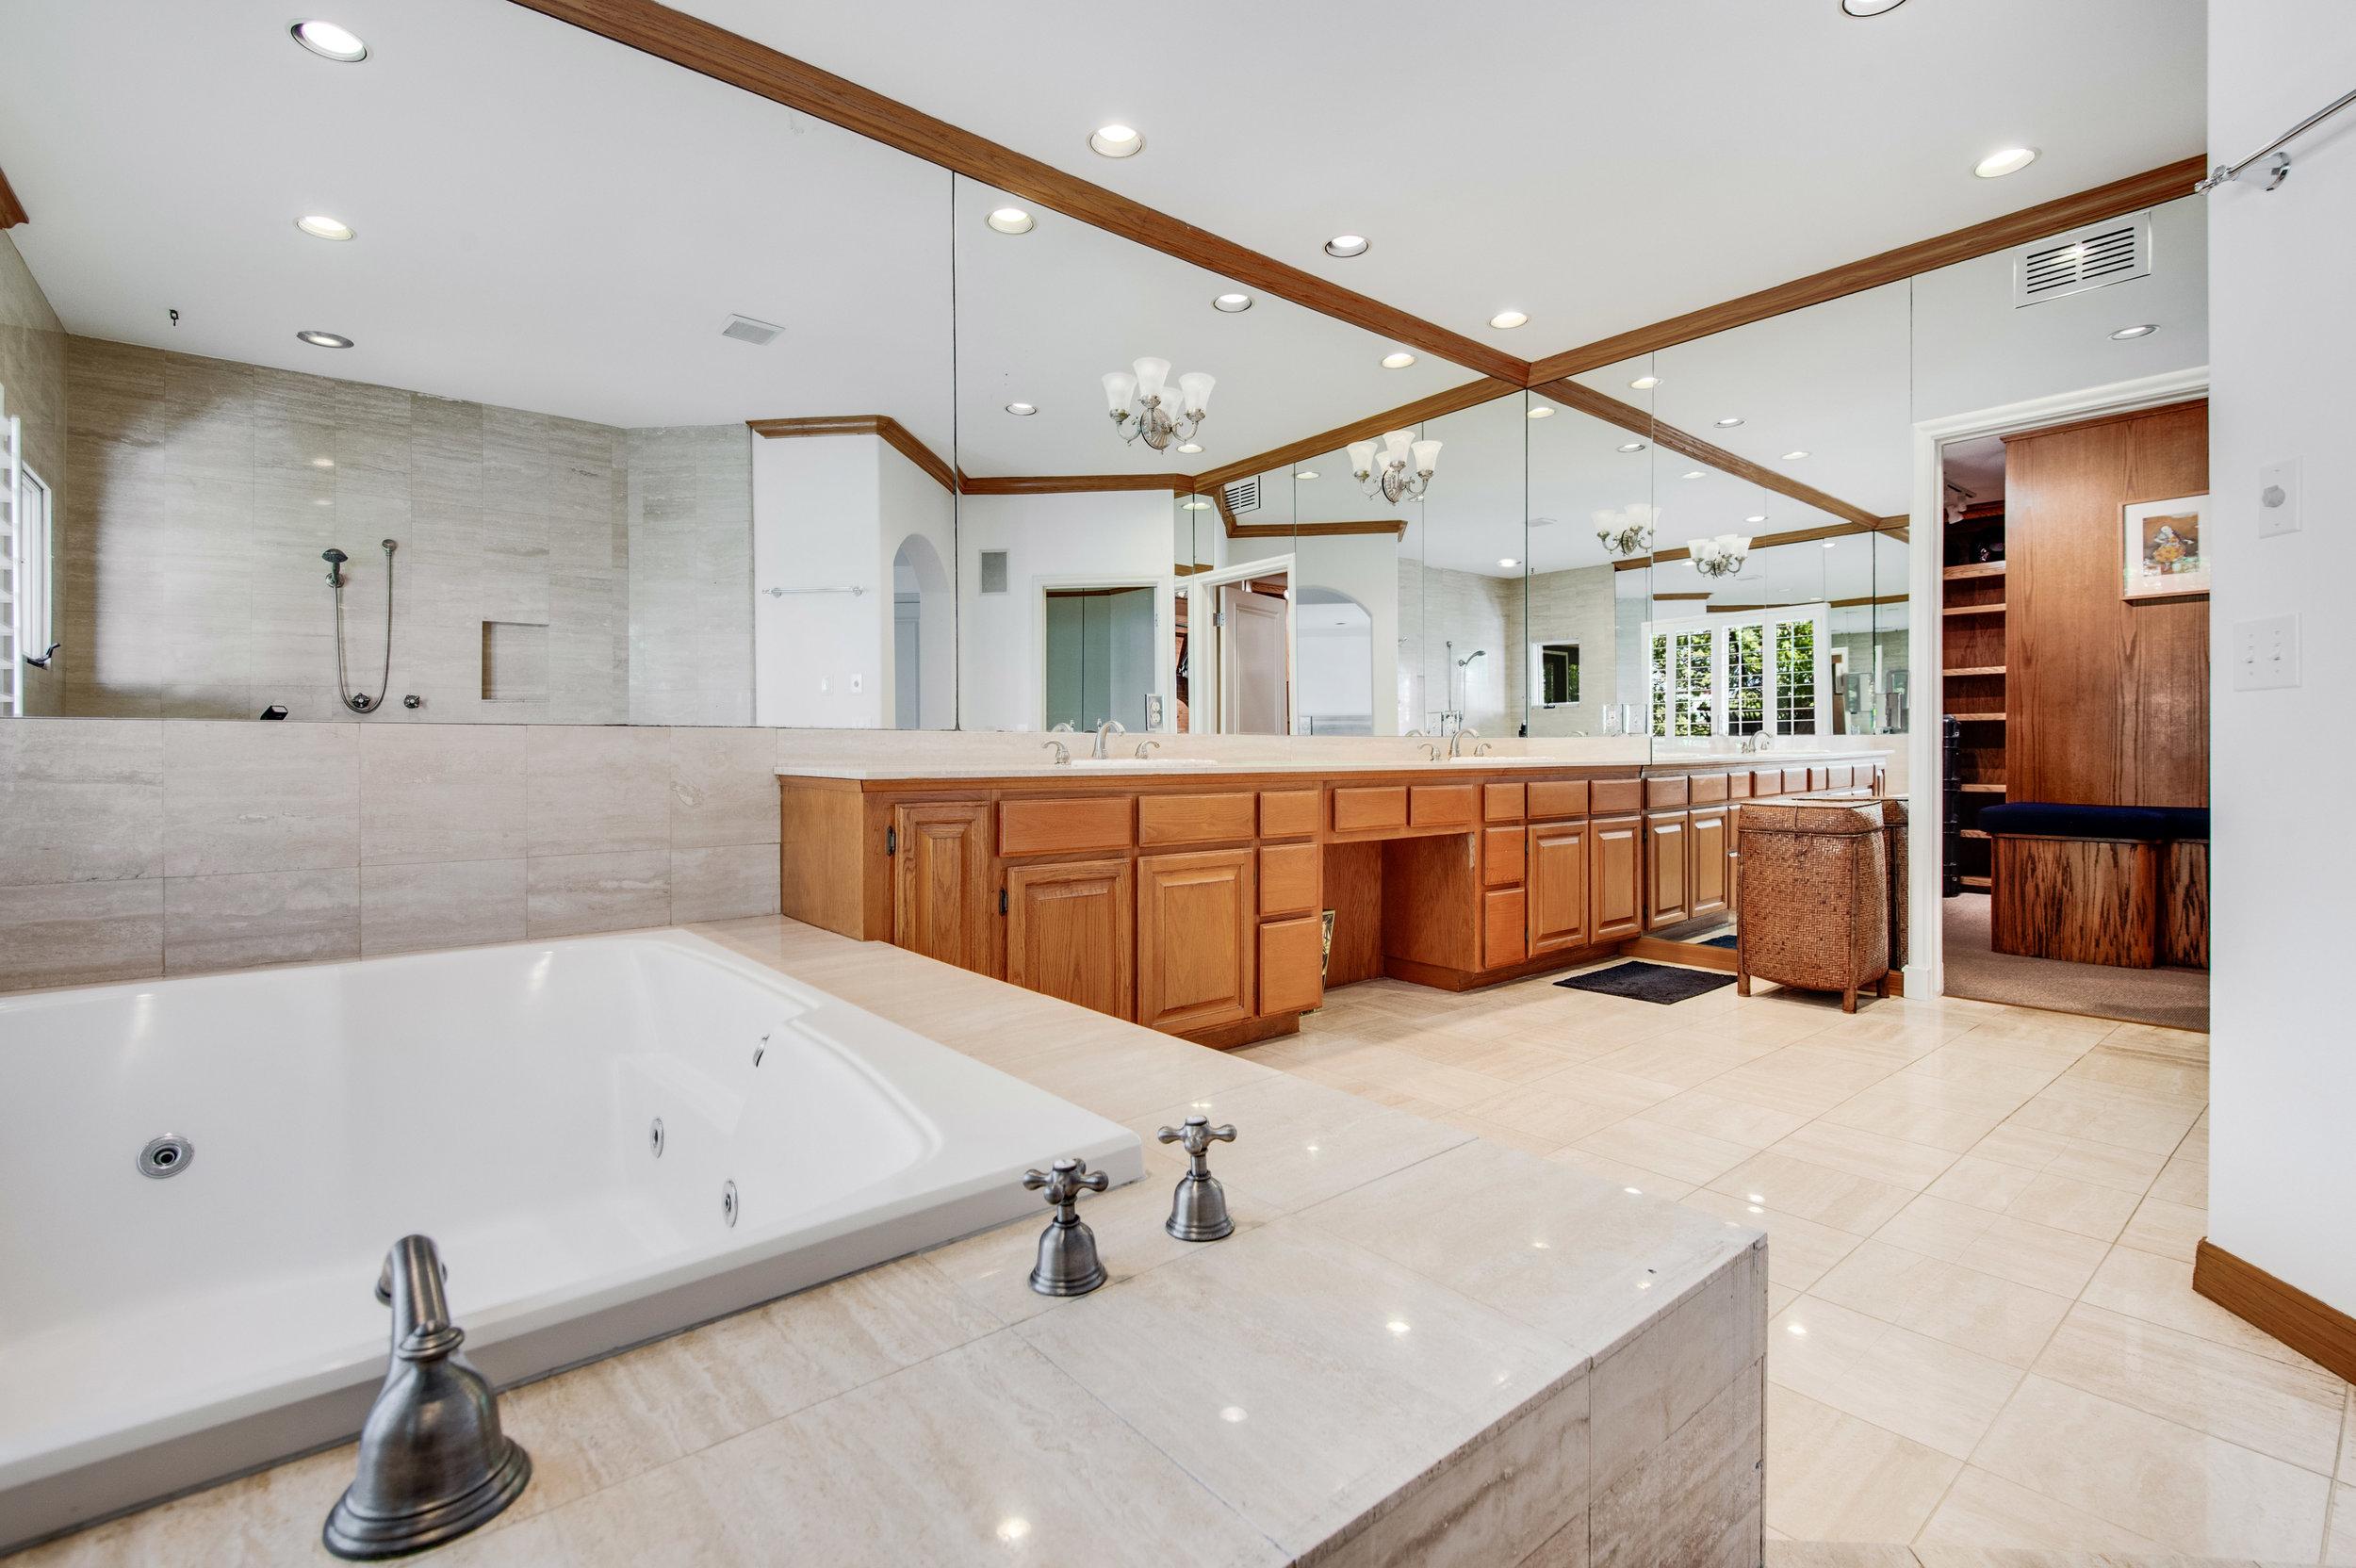 012 Master Bath Malibu For Sale Lease The Malibu Life Team Luxury Real Estate.jpg